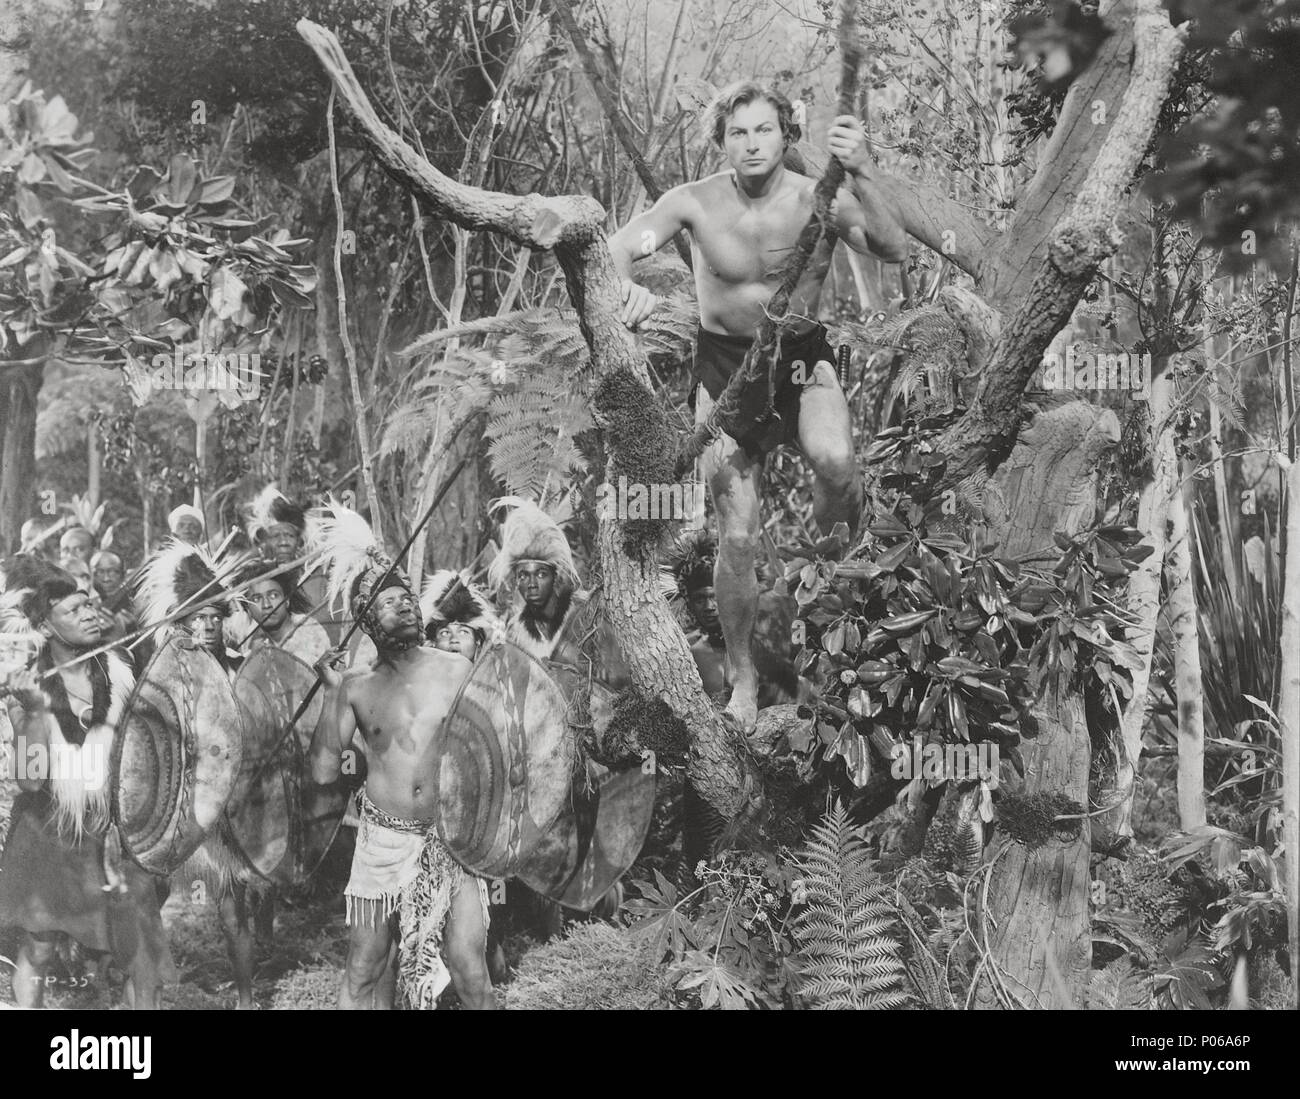 Tarzans Peril Stock Photos & Tarzans Peril Stock Images